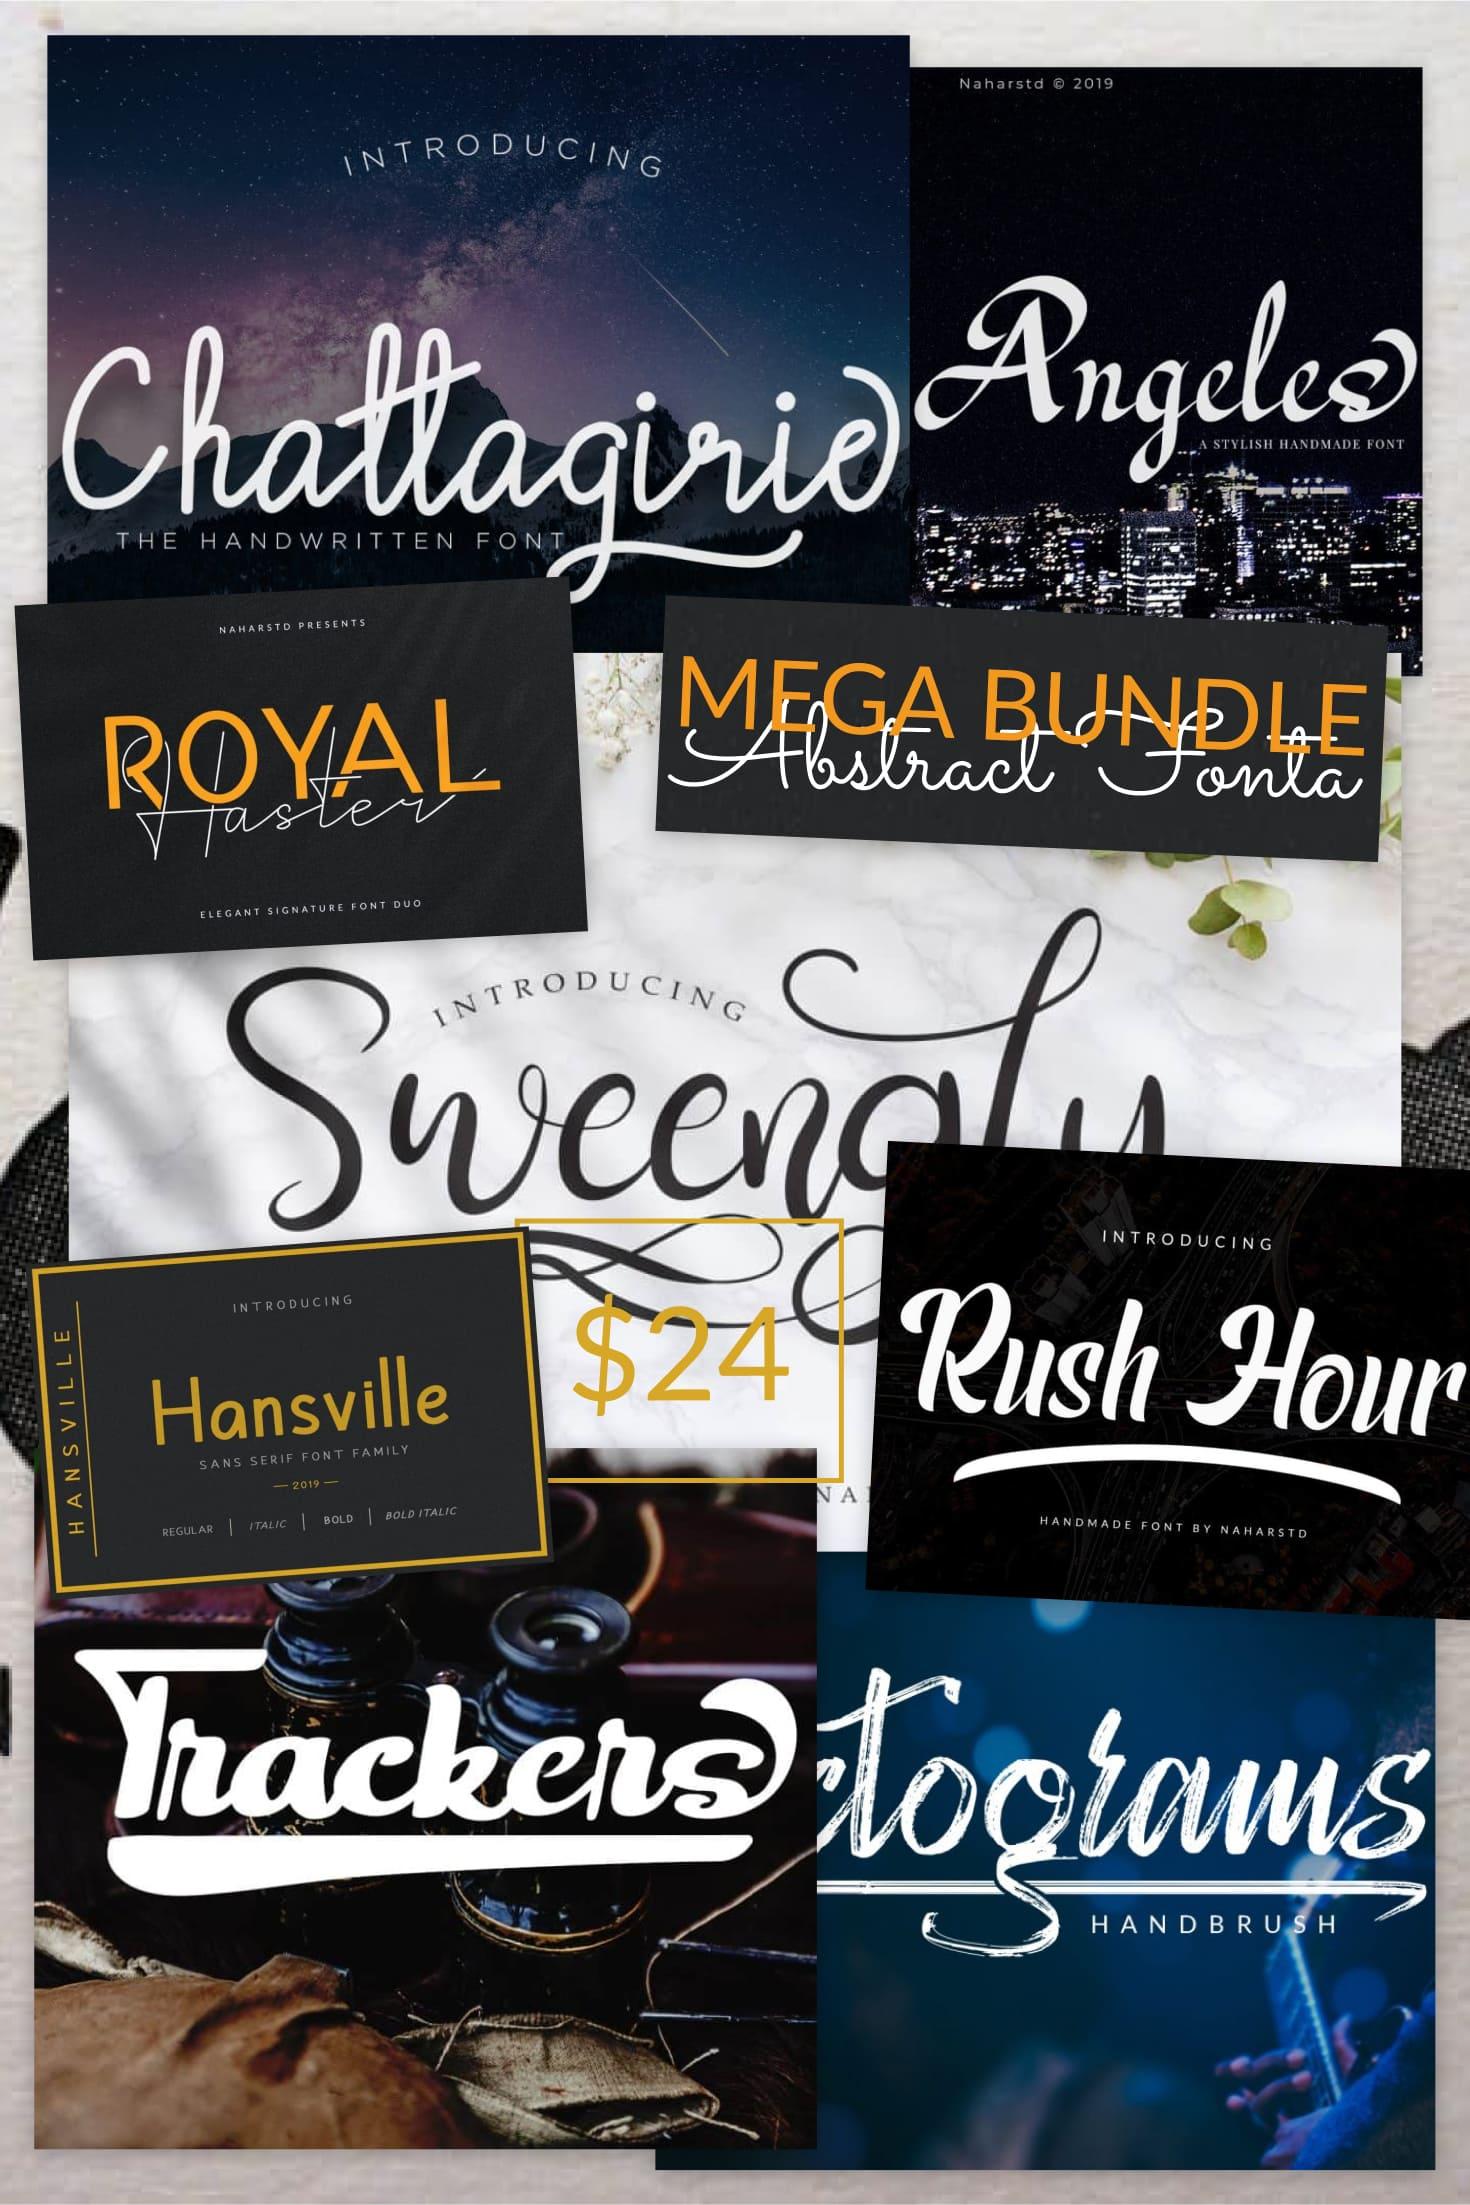 Pinterest Image: MEGA BUNDLE Abstract Fonts! Best Premium Font Collections OTF, TTF Format Download.